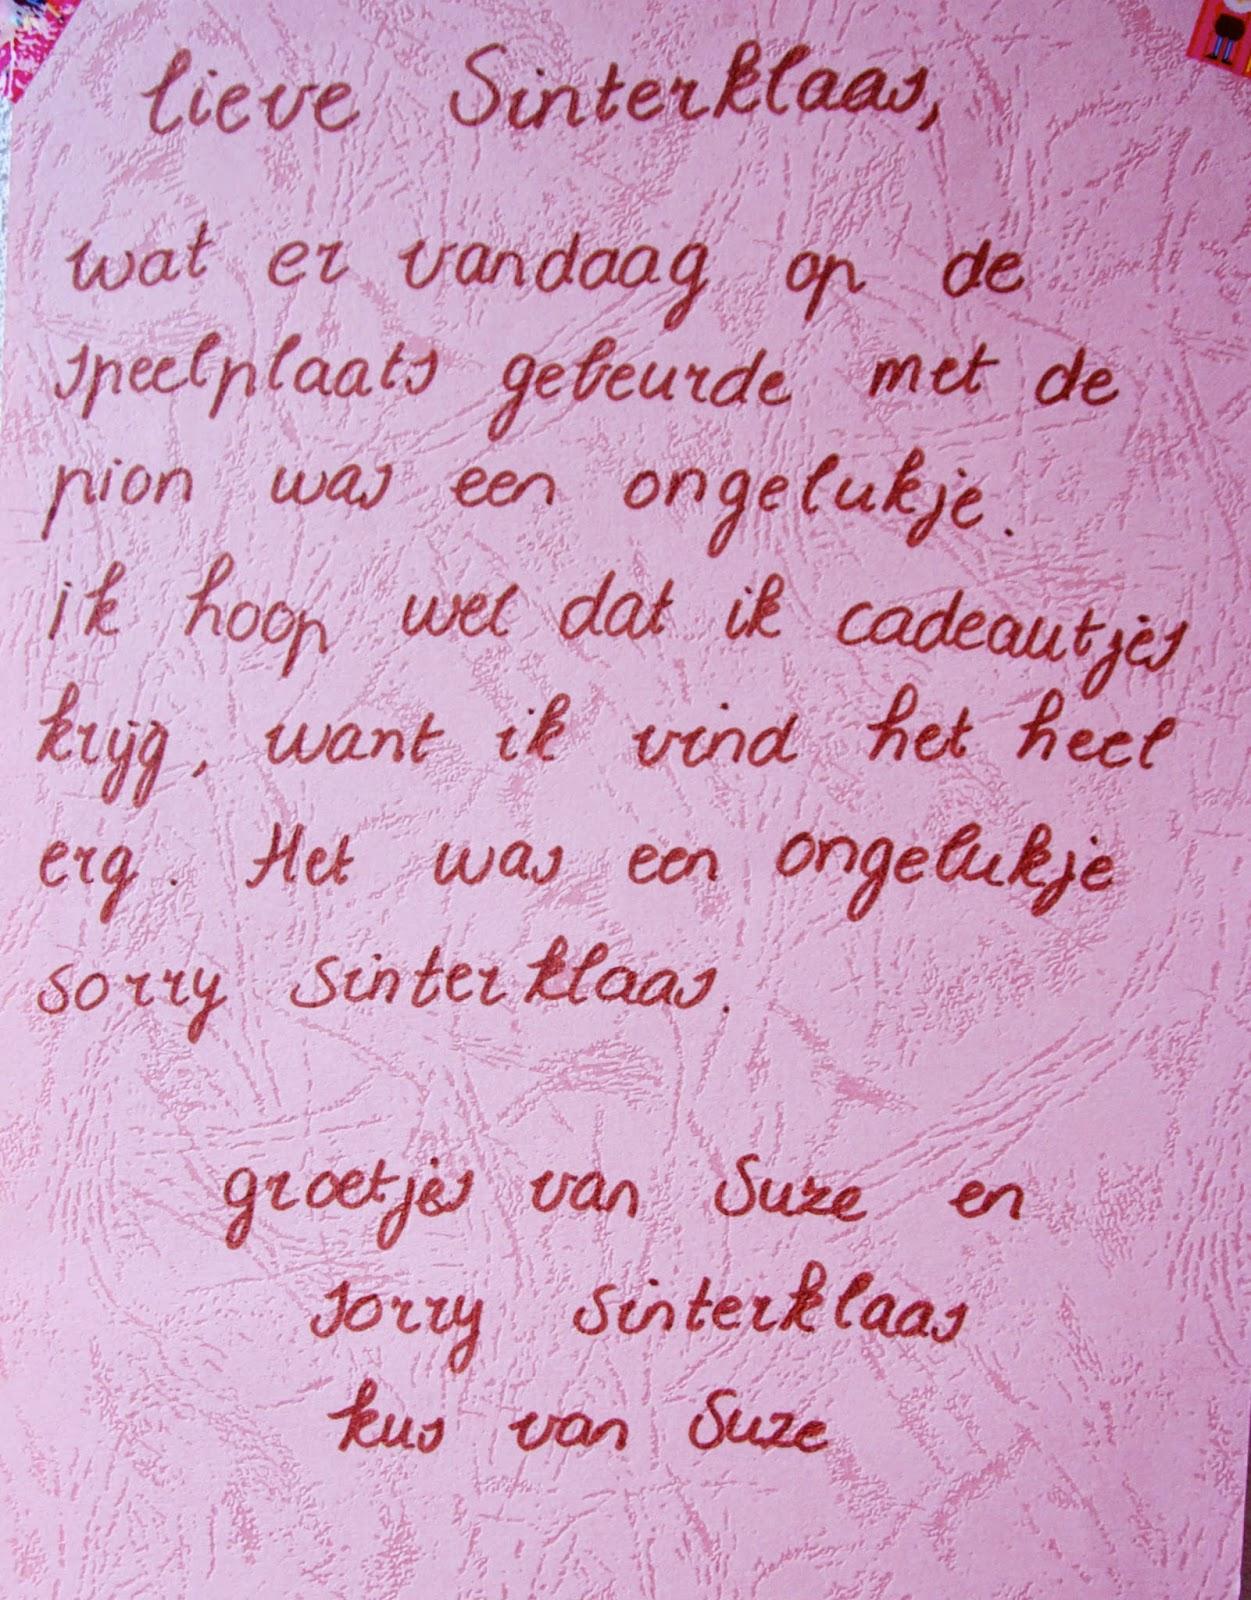 Boevenfeest: Sorry Sinterklaas